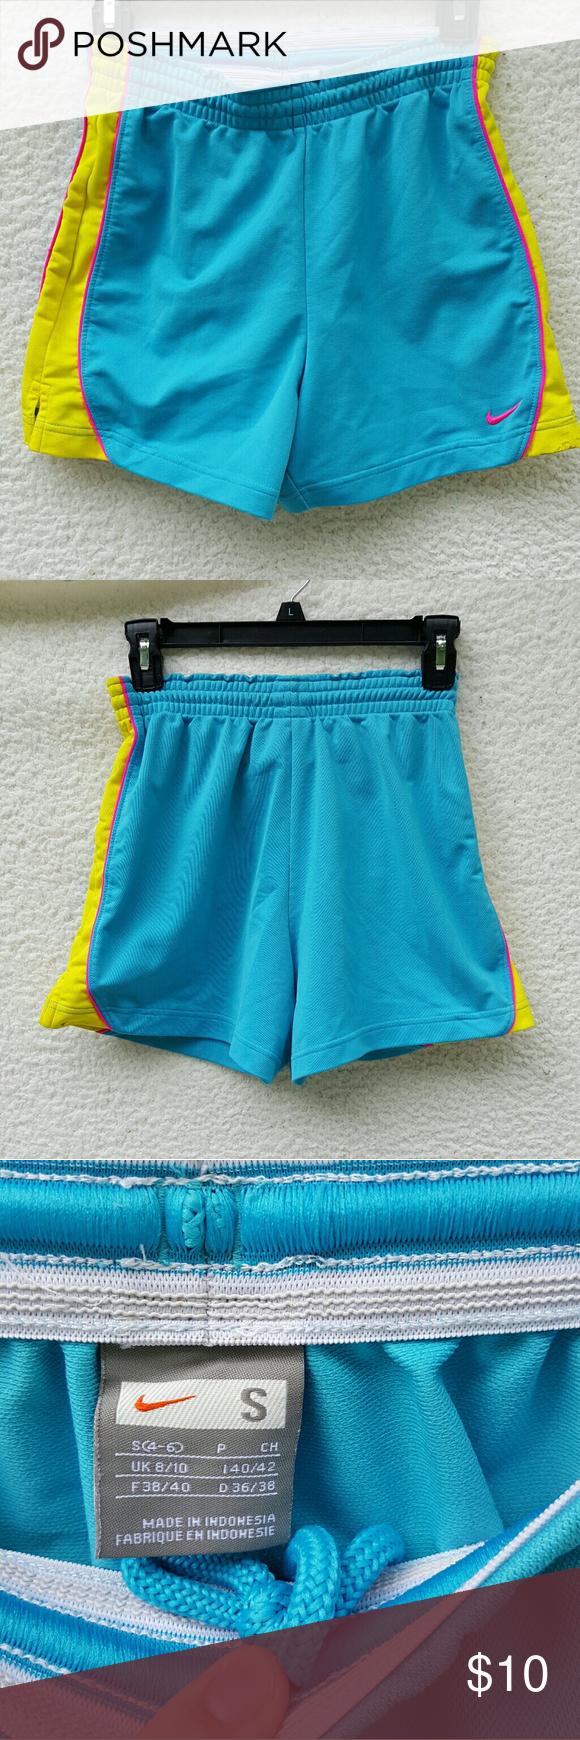 Retro neon Nike shorts Retro bright neon blue, hot pink